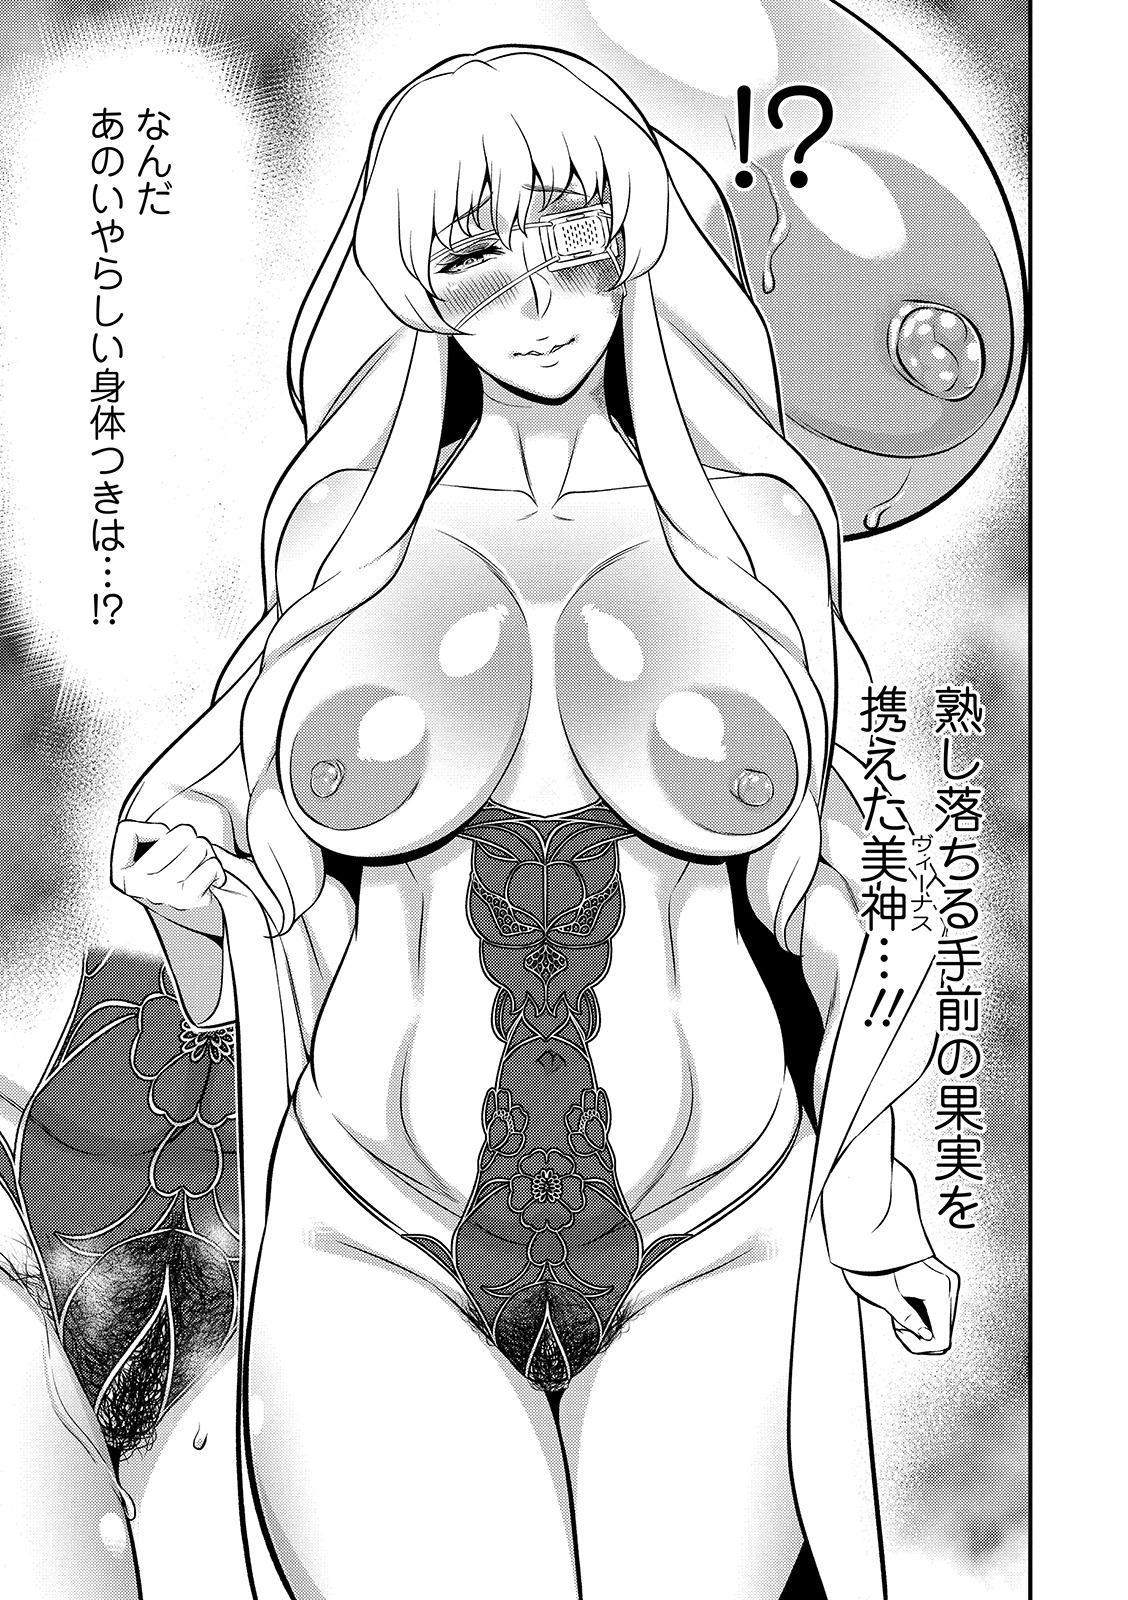 COMIC Shigekiteki SQUIRT!! Vol. 15 244